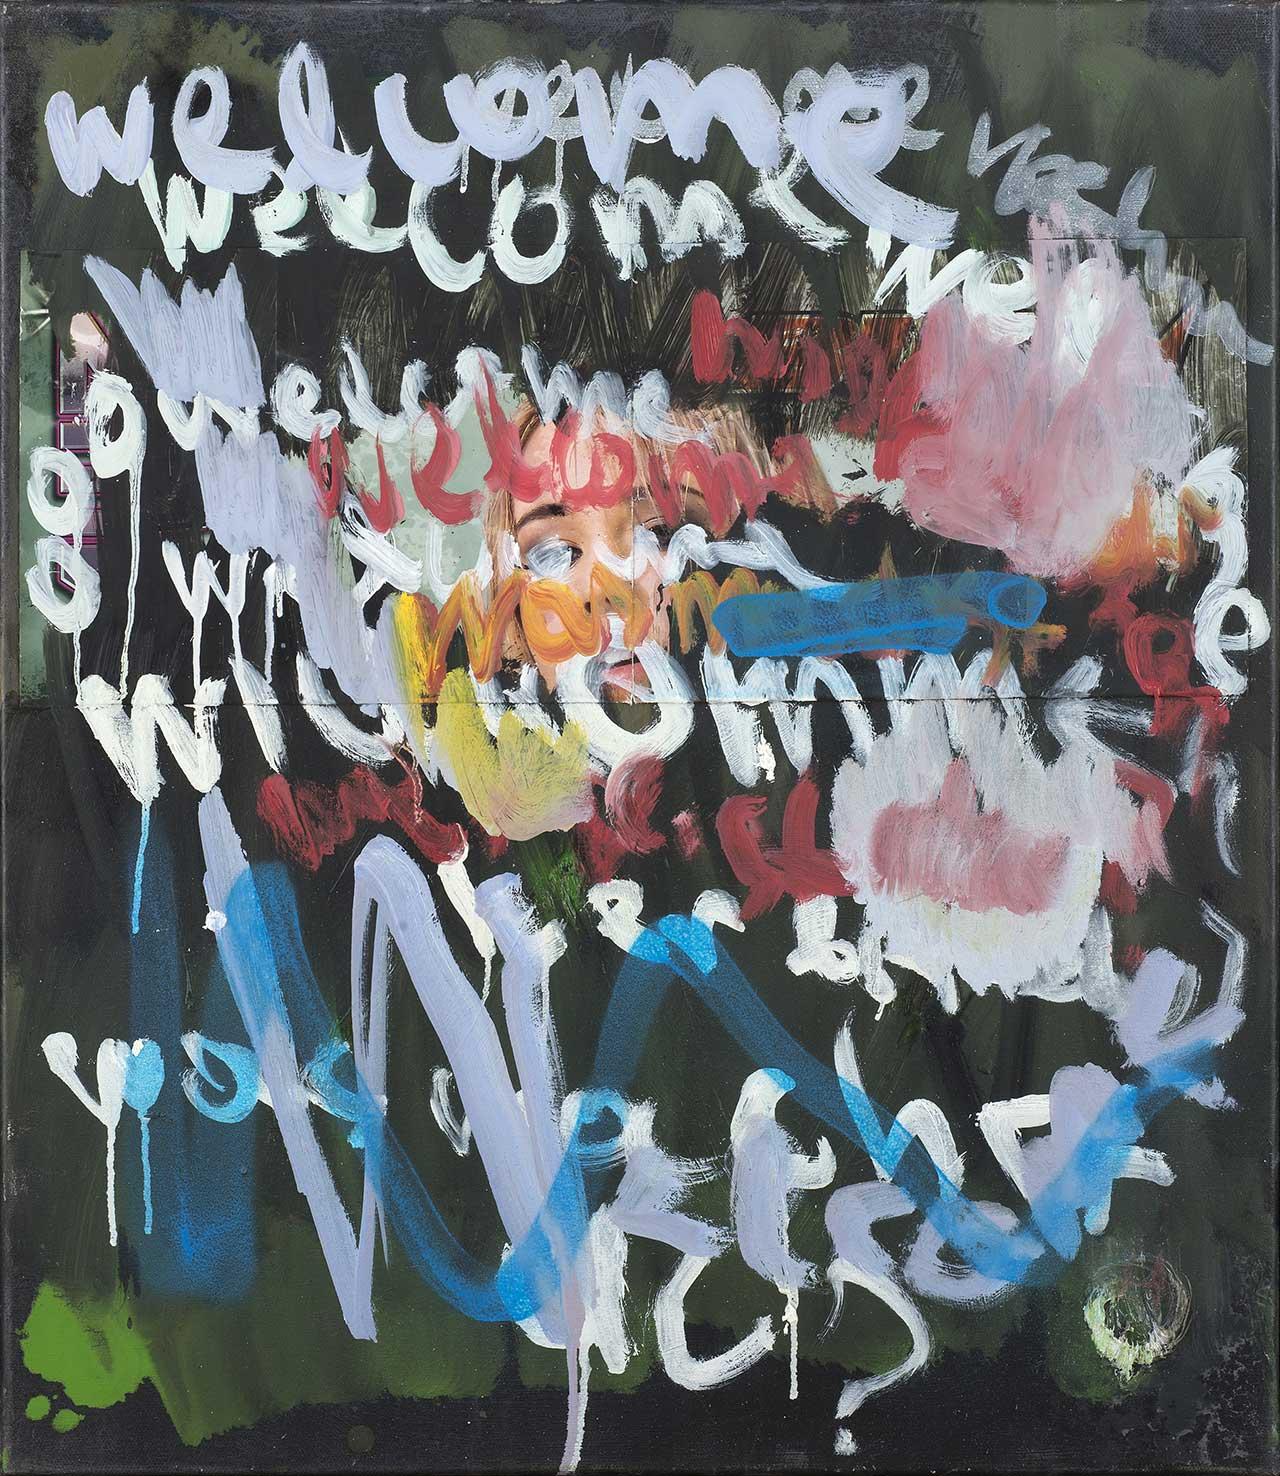 Welcome, 2012, λάδι σε καμβά, κολάζ, σπρέι, 70x60 εκ.